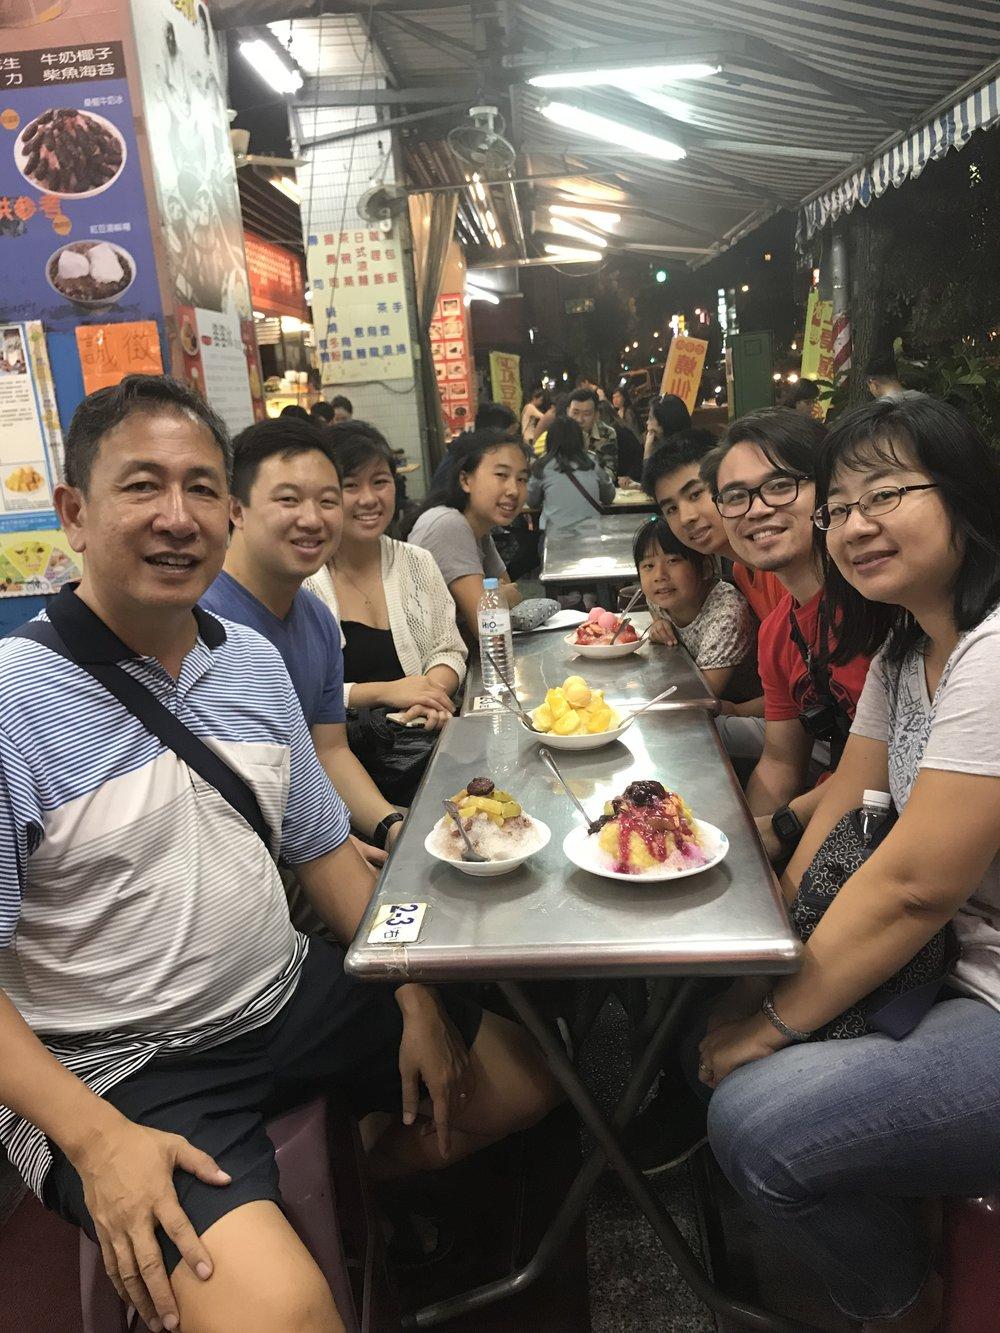 TCP Team + Hsu Family + Shaved Ice